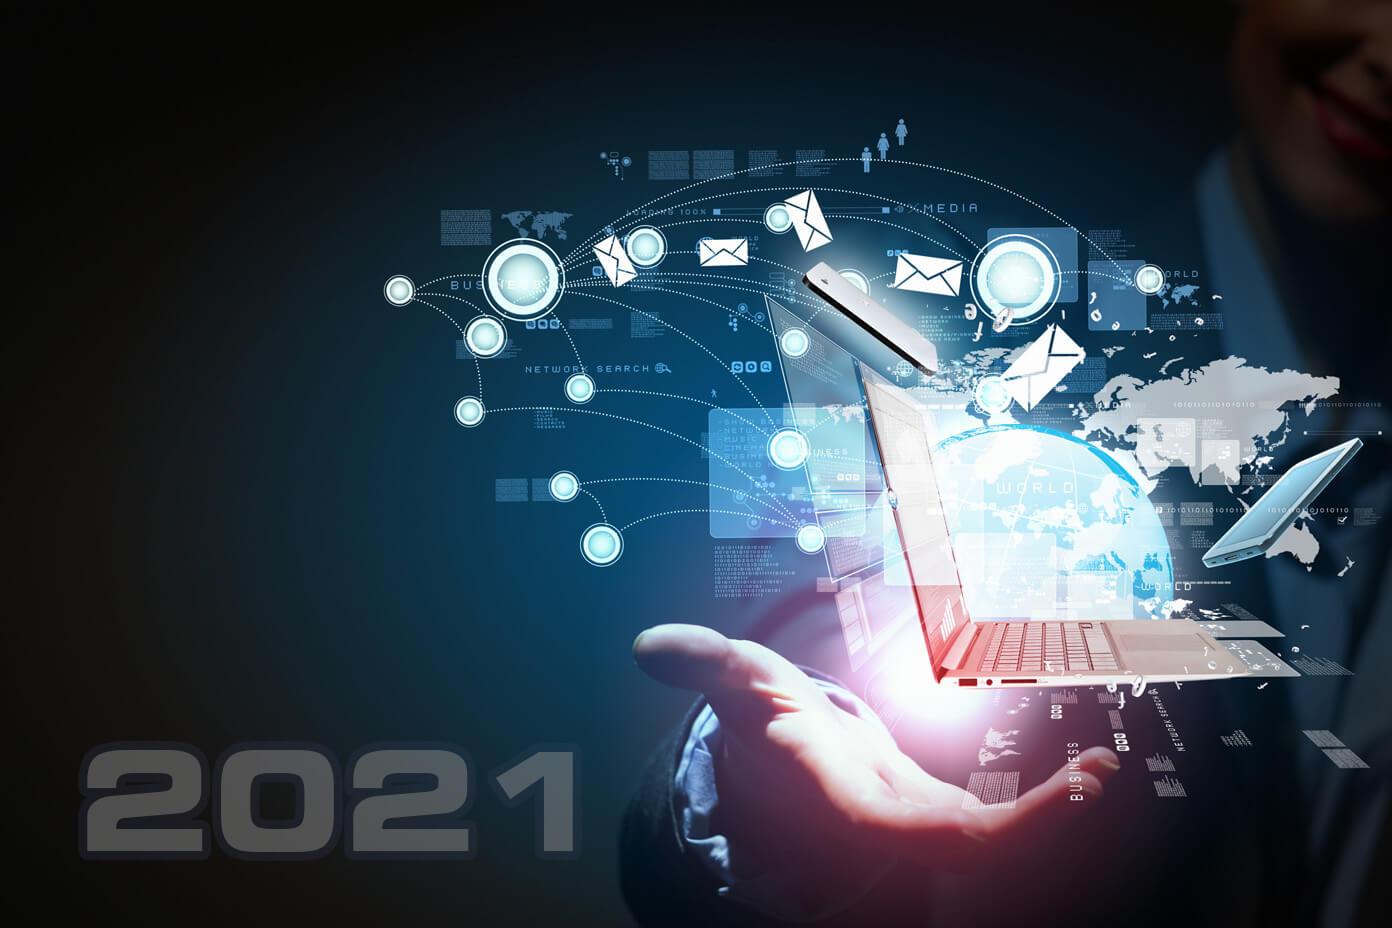 7 Most Crucial Enterprise Content Management Trends for 2021